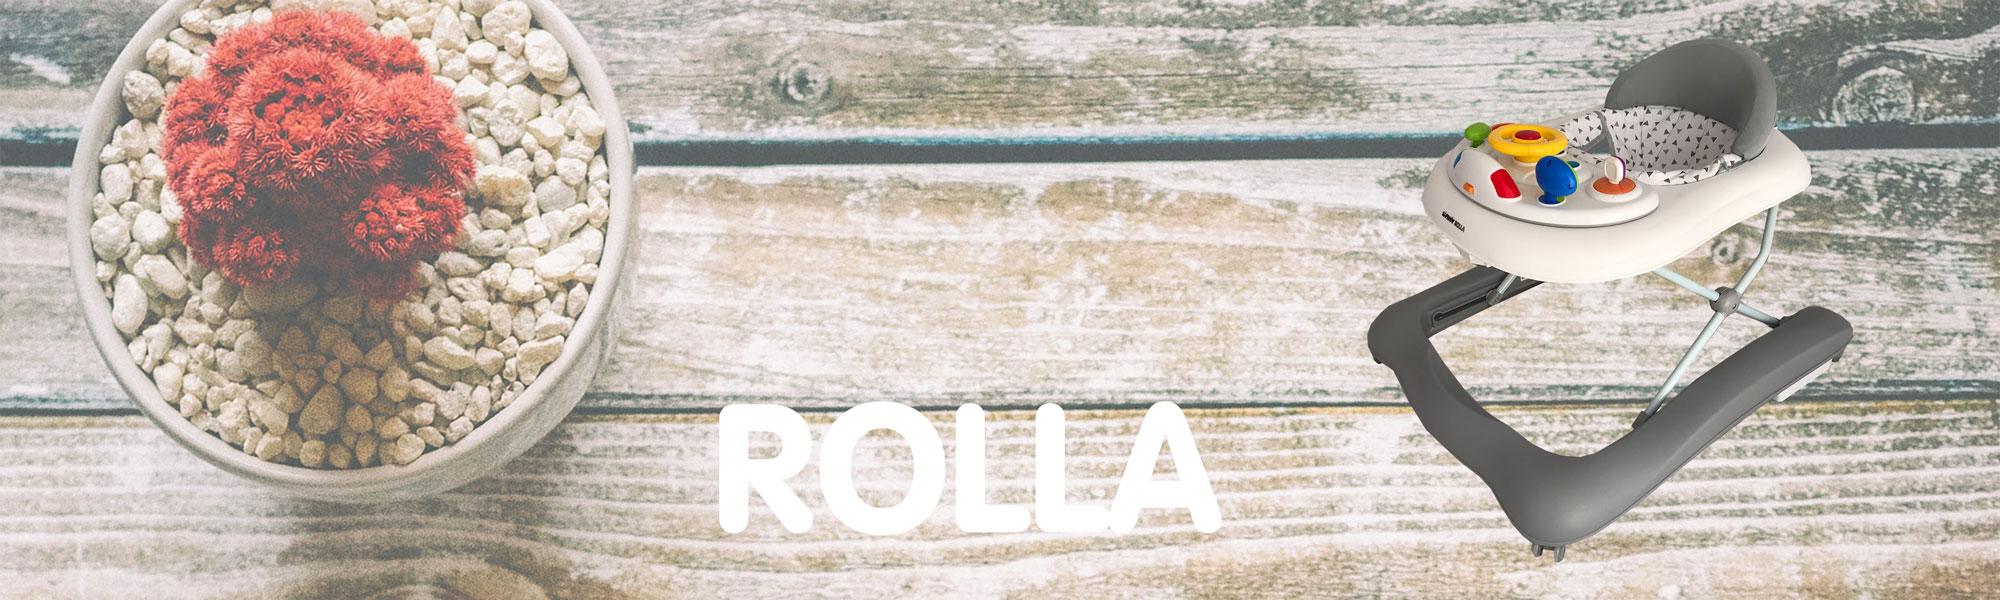 Rolla-2000x600